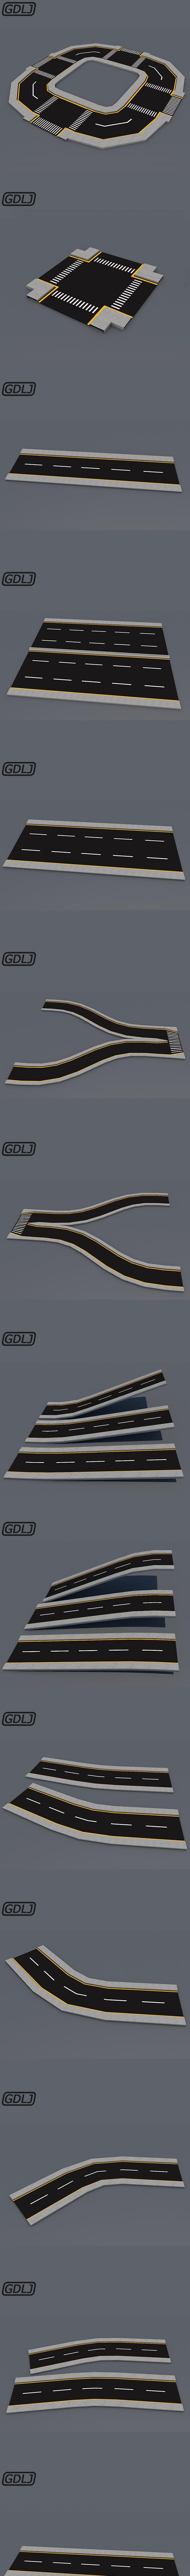 43 Street road - integrated design - 3DOcean Item for Sale